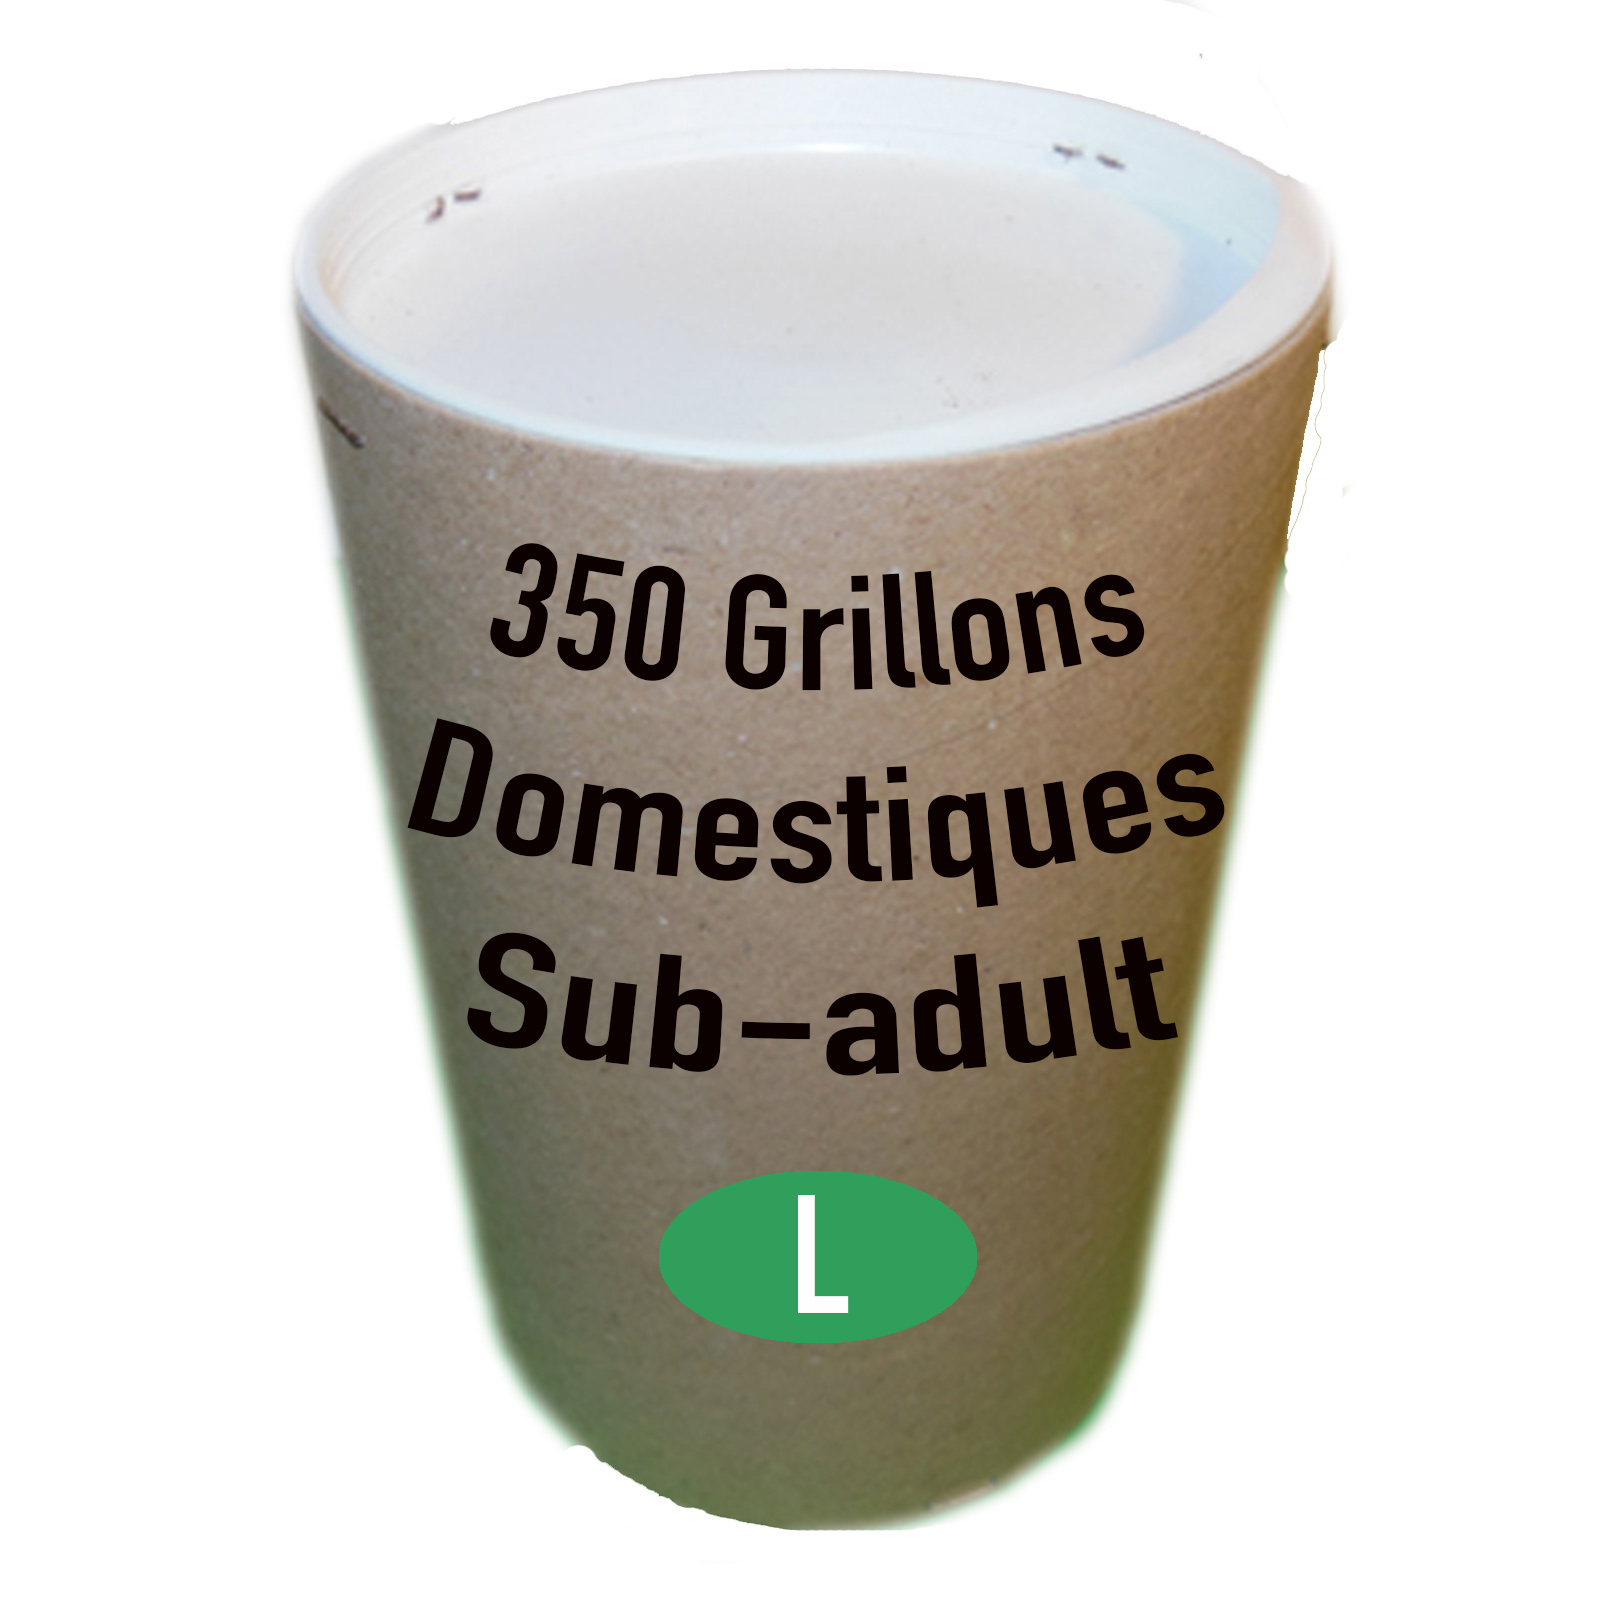 GRILLONS DOMESTIQUES SUB ADULTES X 350